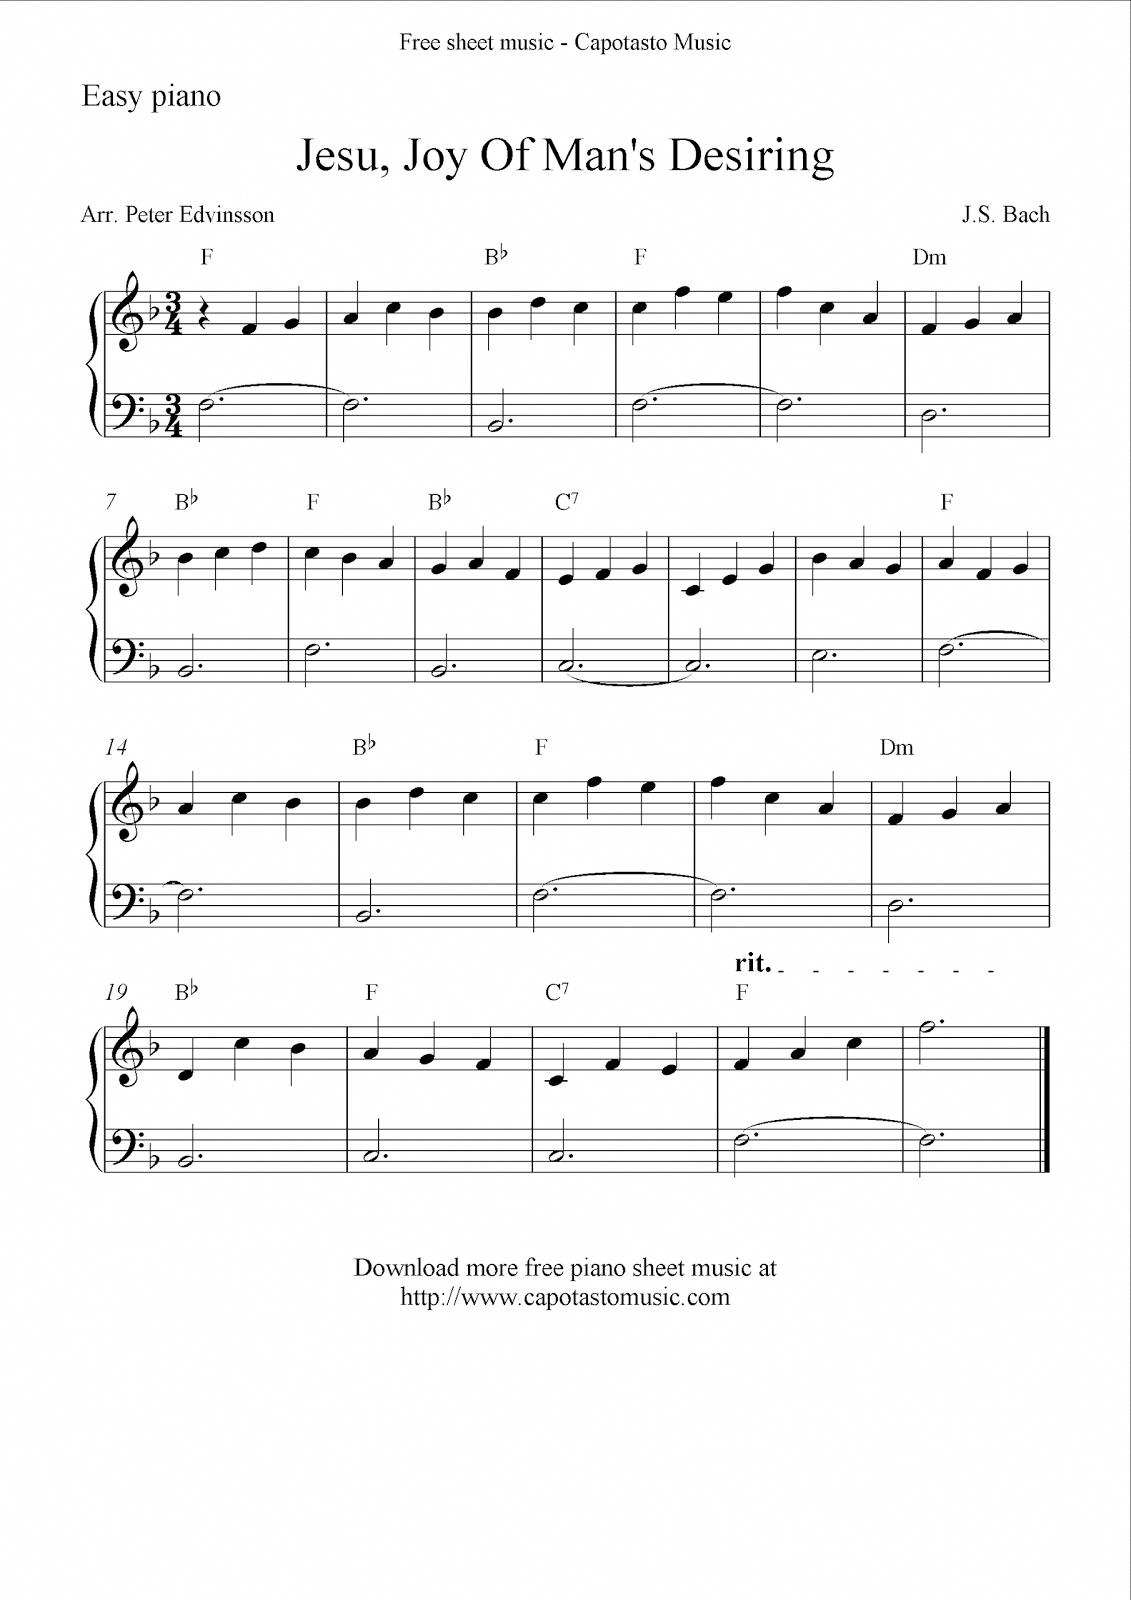 Beginner Piano Worksheets Printable Free